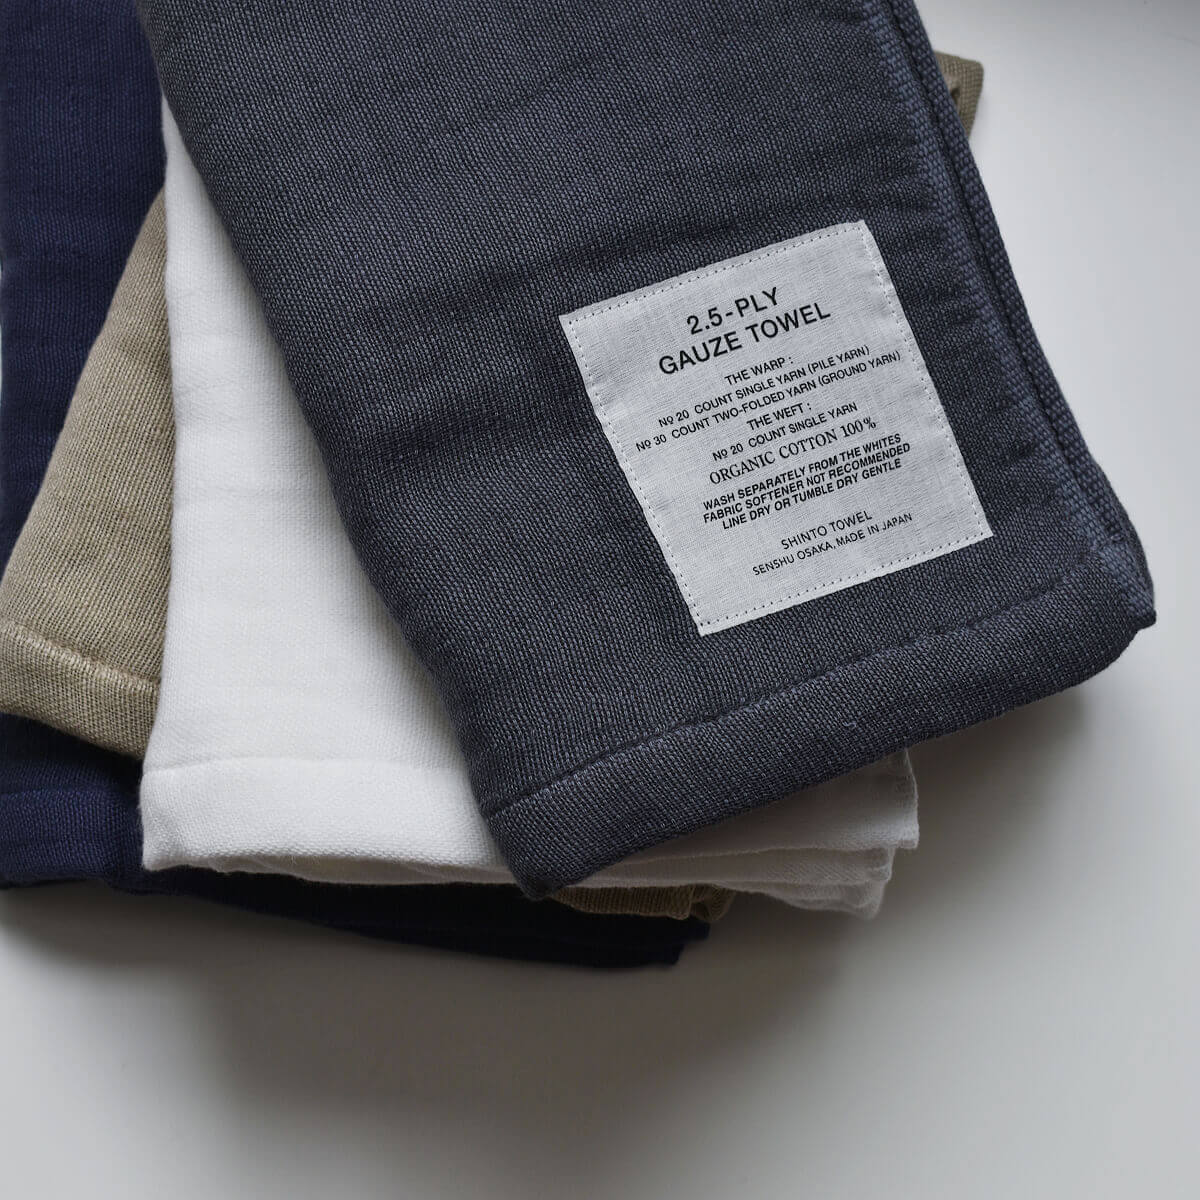 2.5ply gauze towel(神藤タオル)